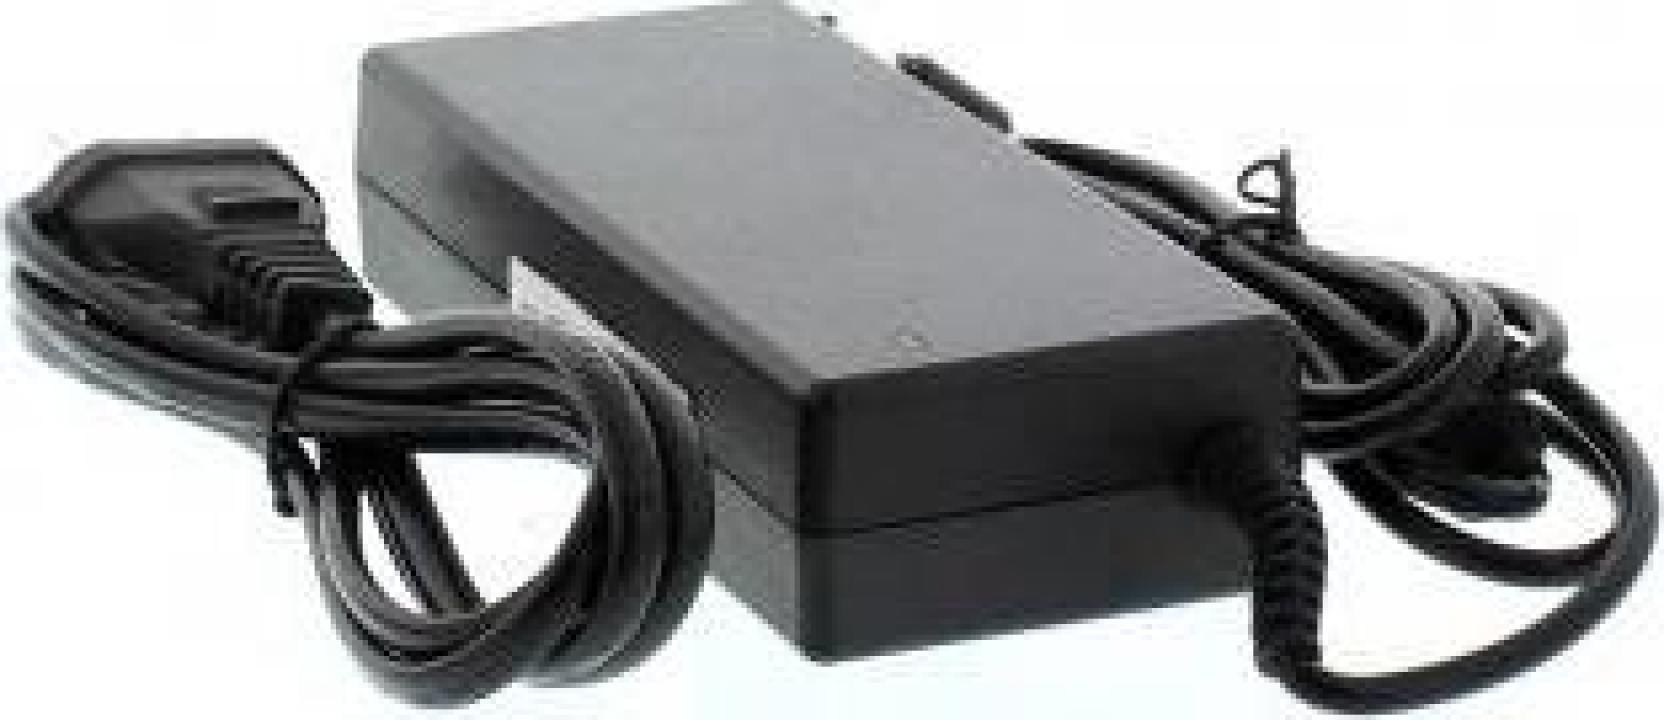 Alimentator pentru laptop Sony, 19.5V 4.1A 80W, mufa 6.5X4.4